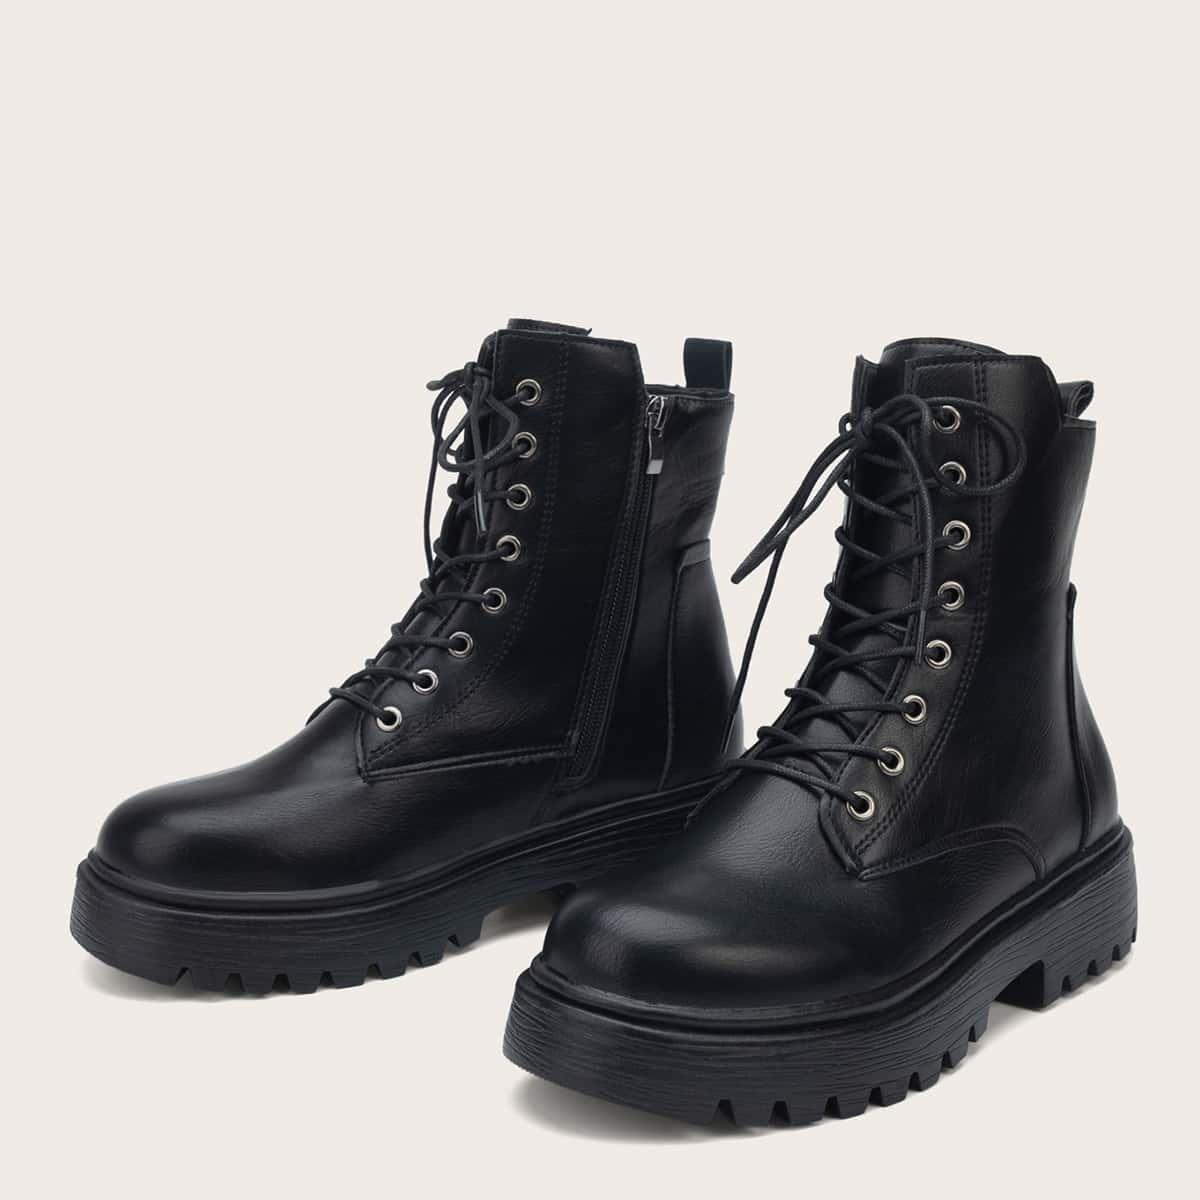 Минималистские ботинки на шнурках